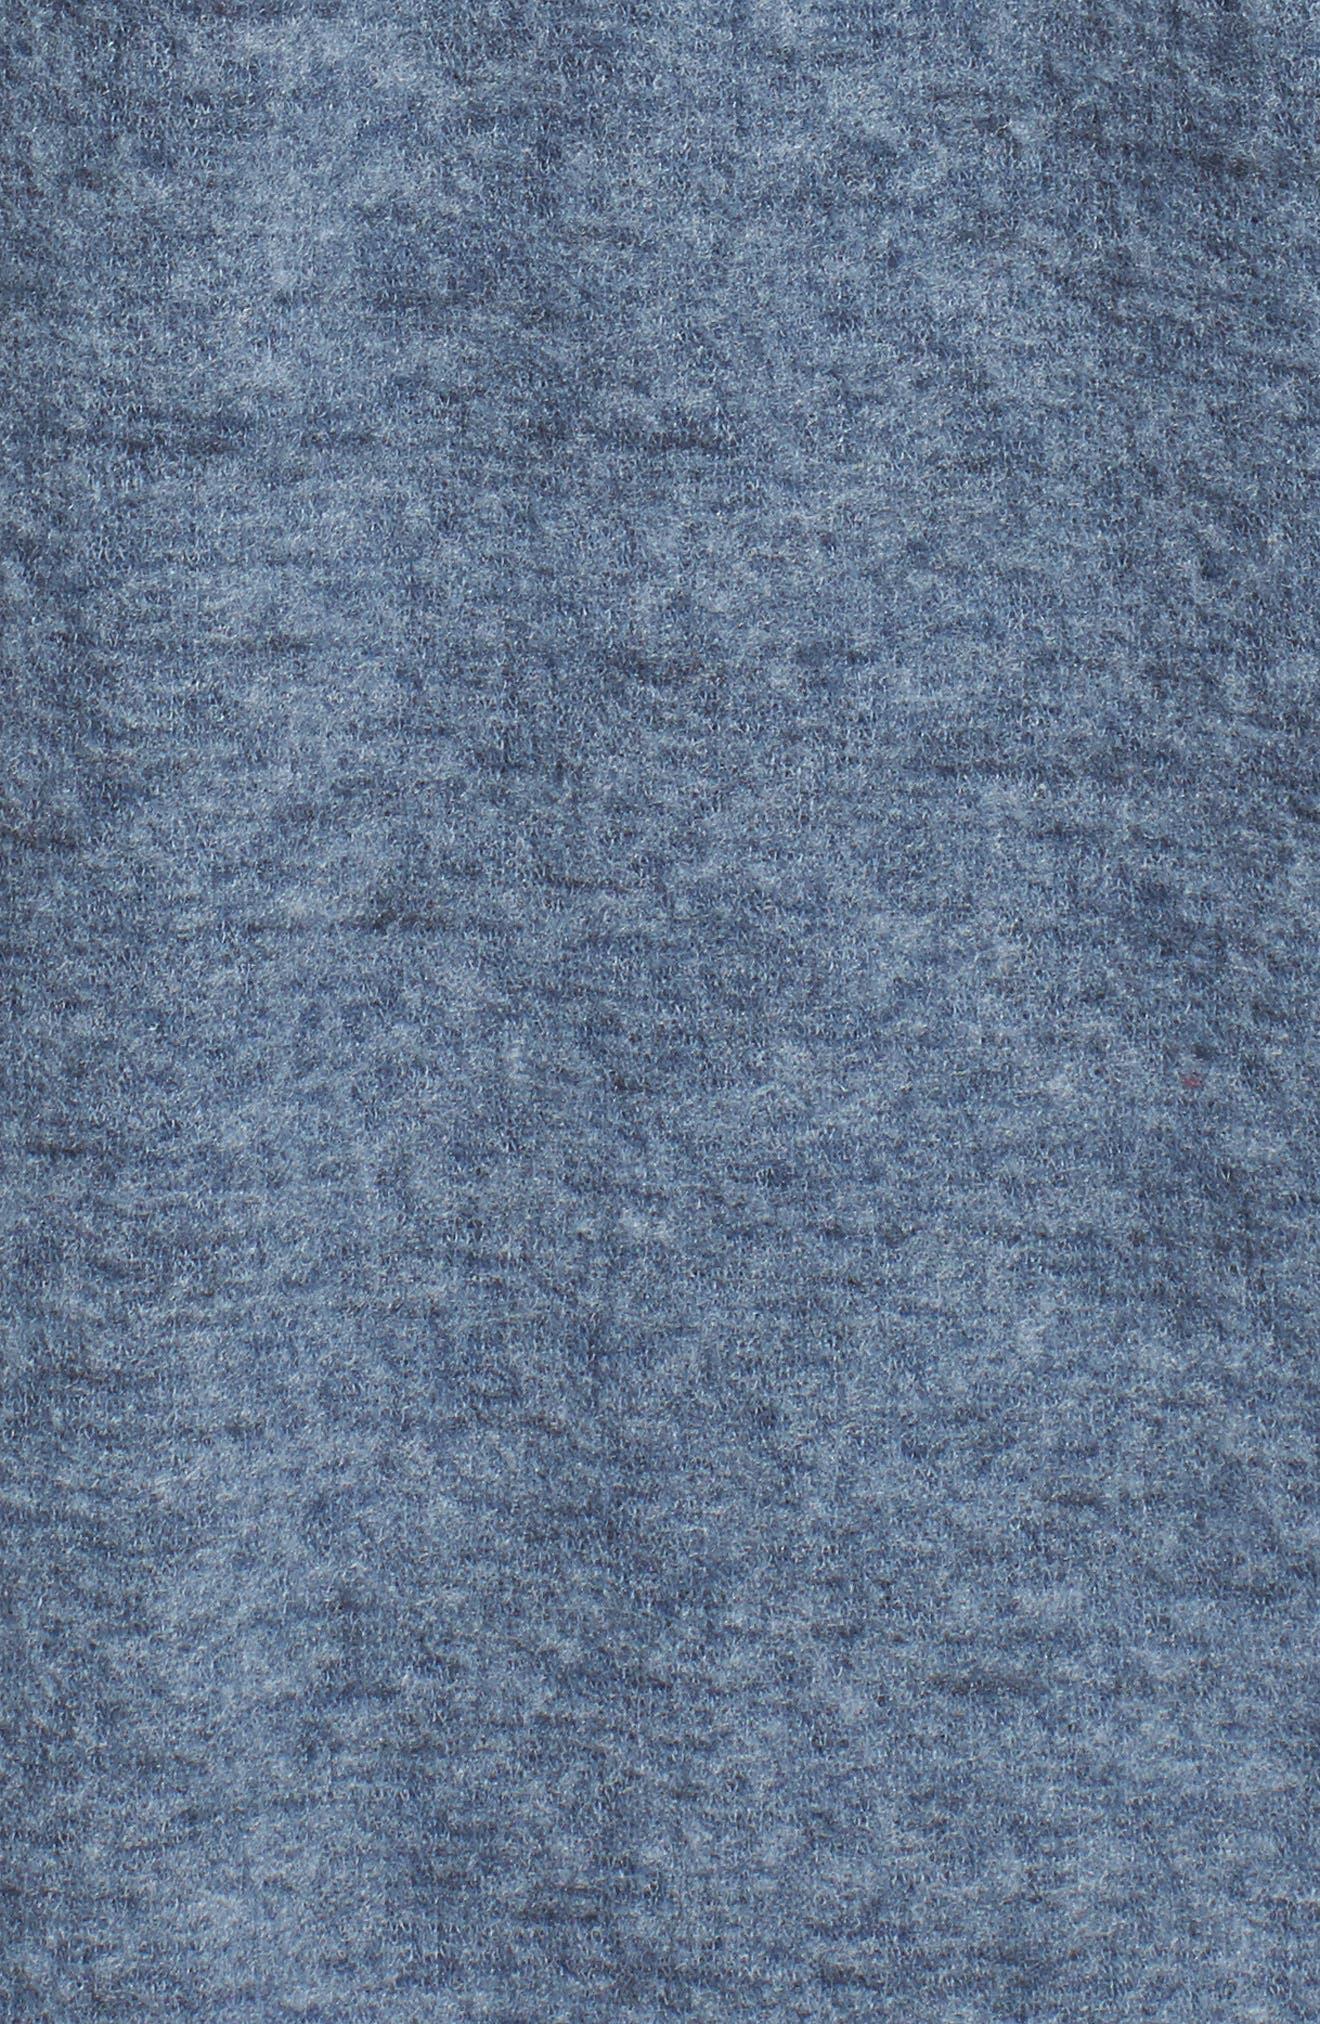 Caslon Open Knit Cardigan,                             Alternate thumbnail 5, color,                             Navy